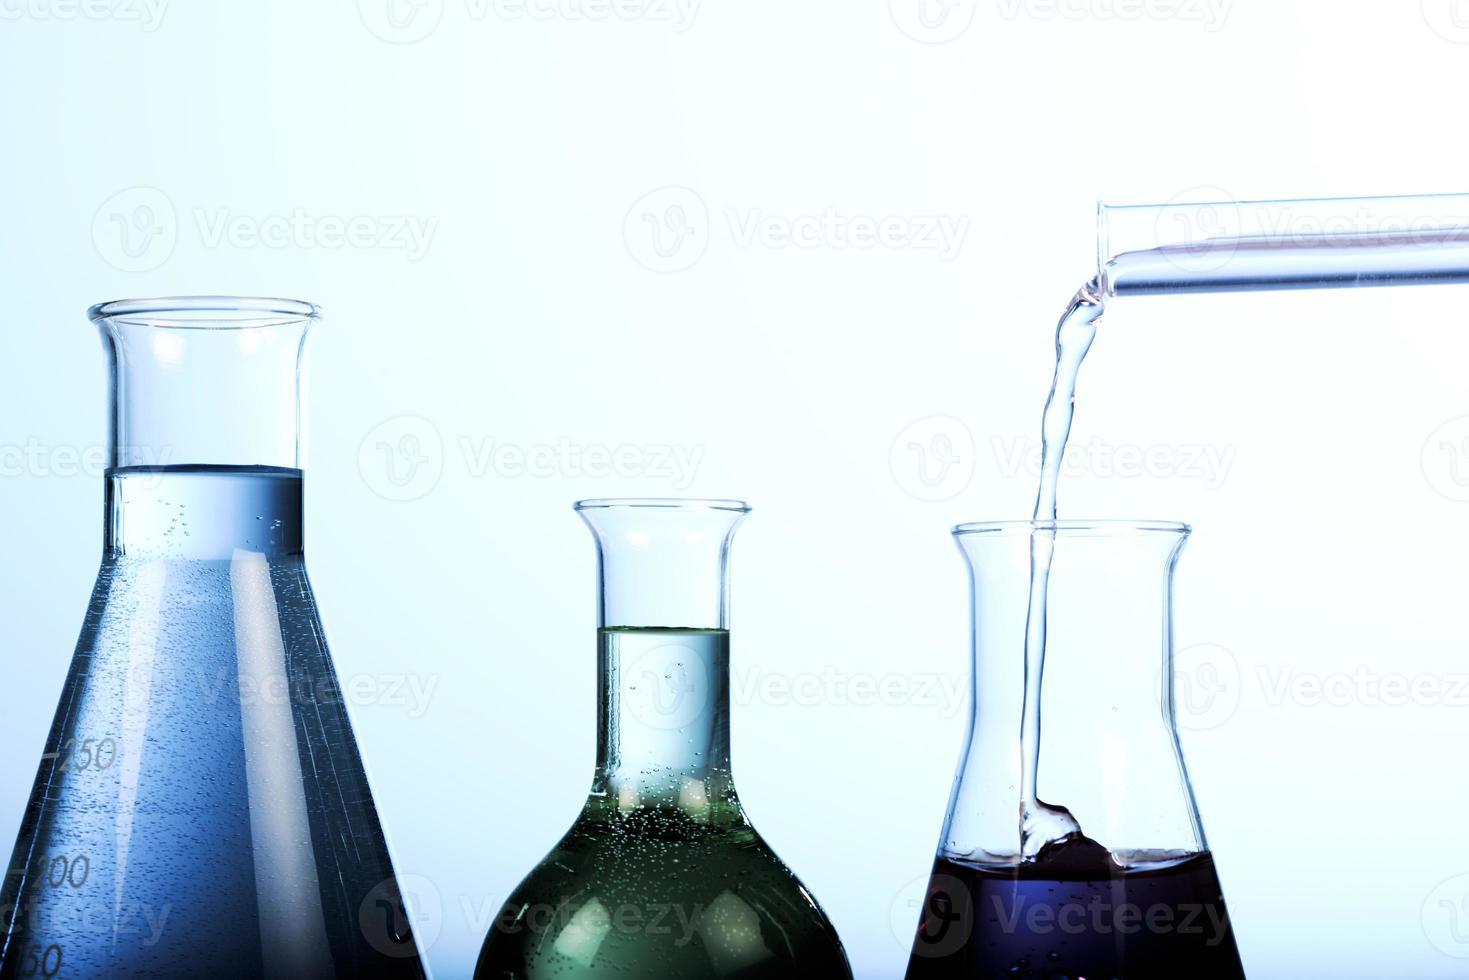 científico-médico - pesquisa foto